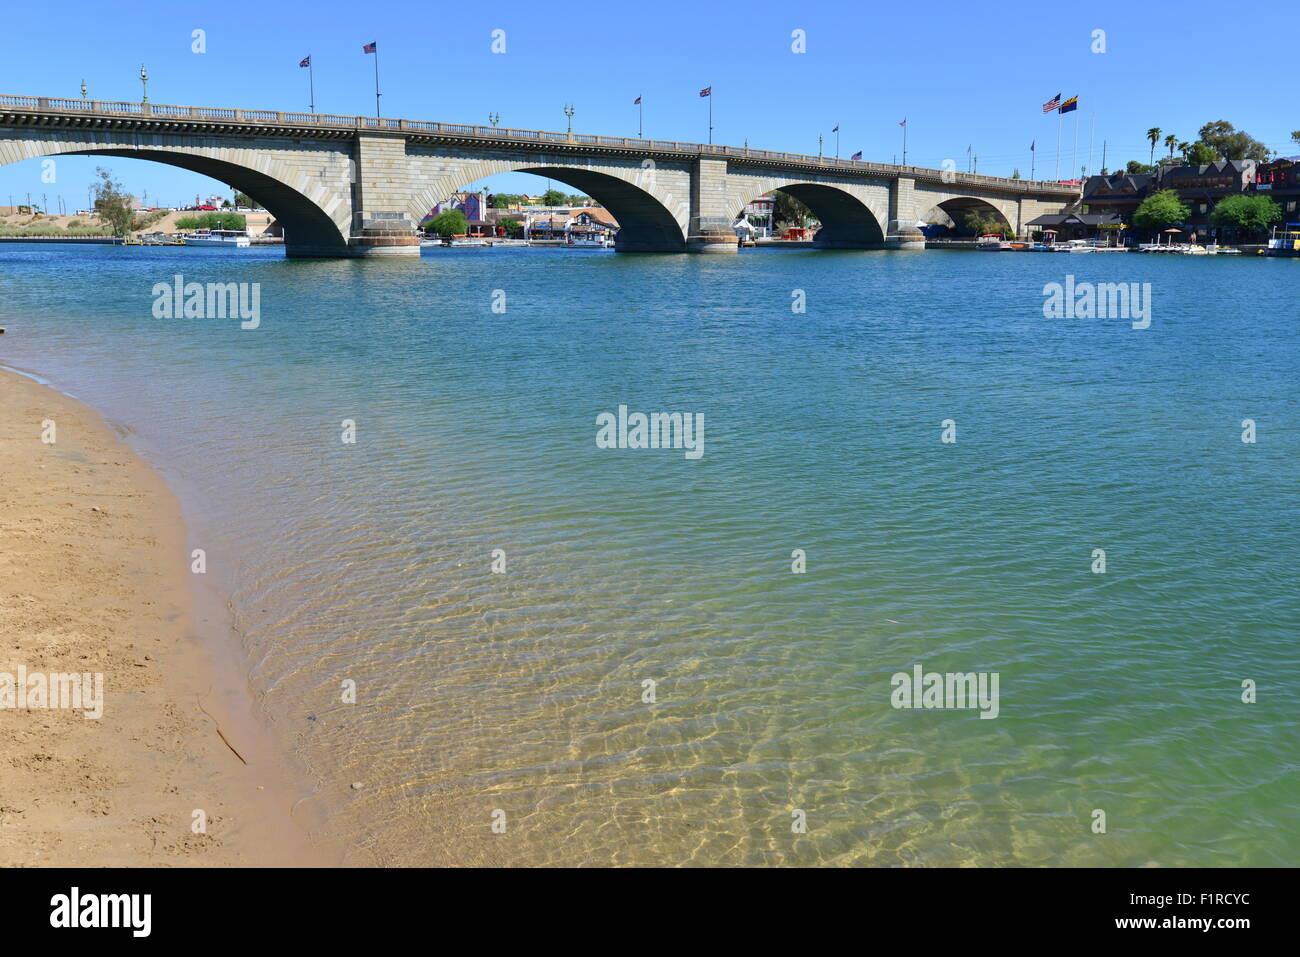 London Bridge On Lake Havasu In Arizona In Late Summer Stock Photo Alamy